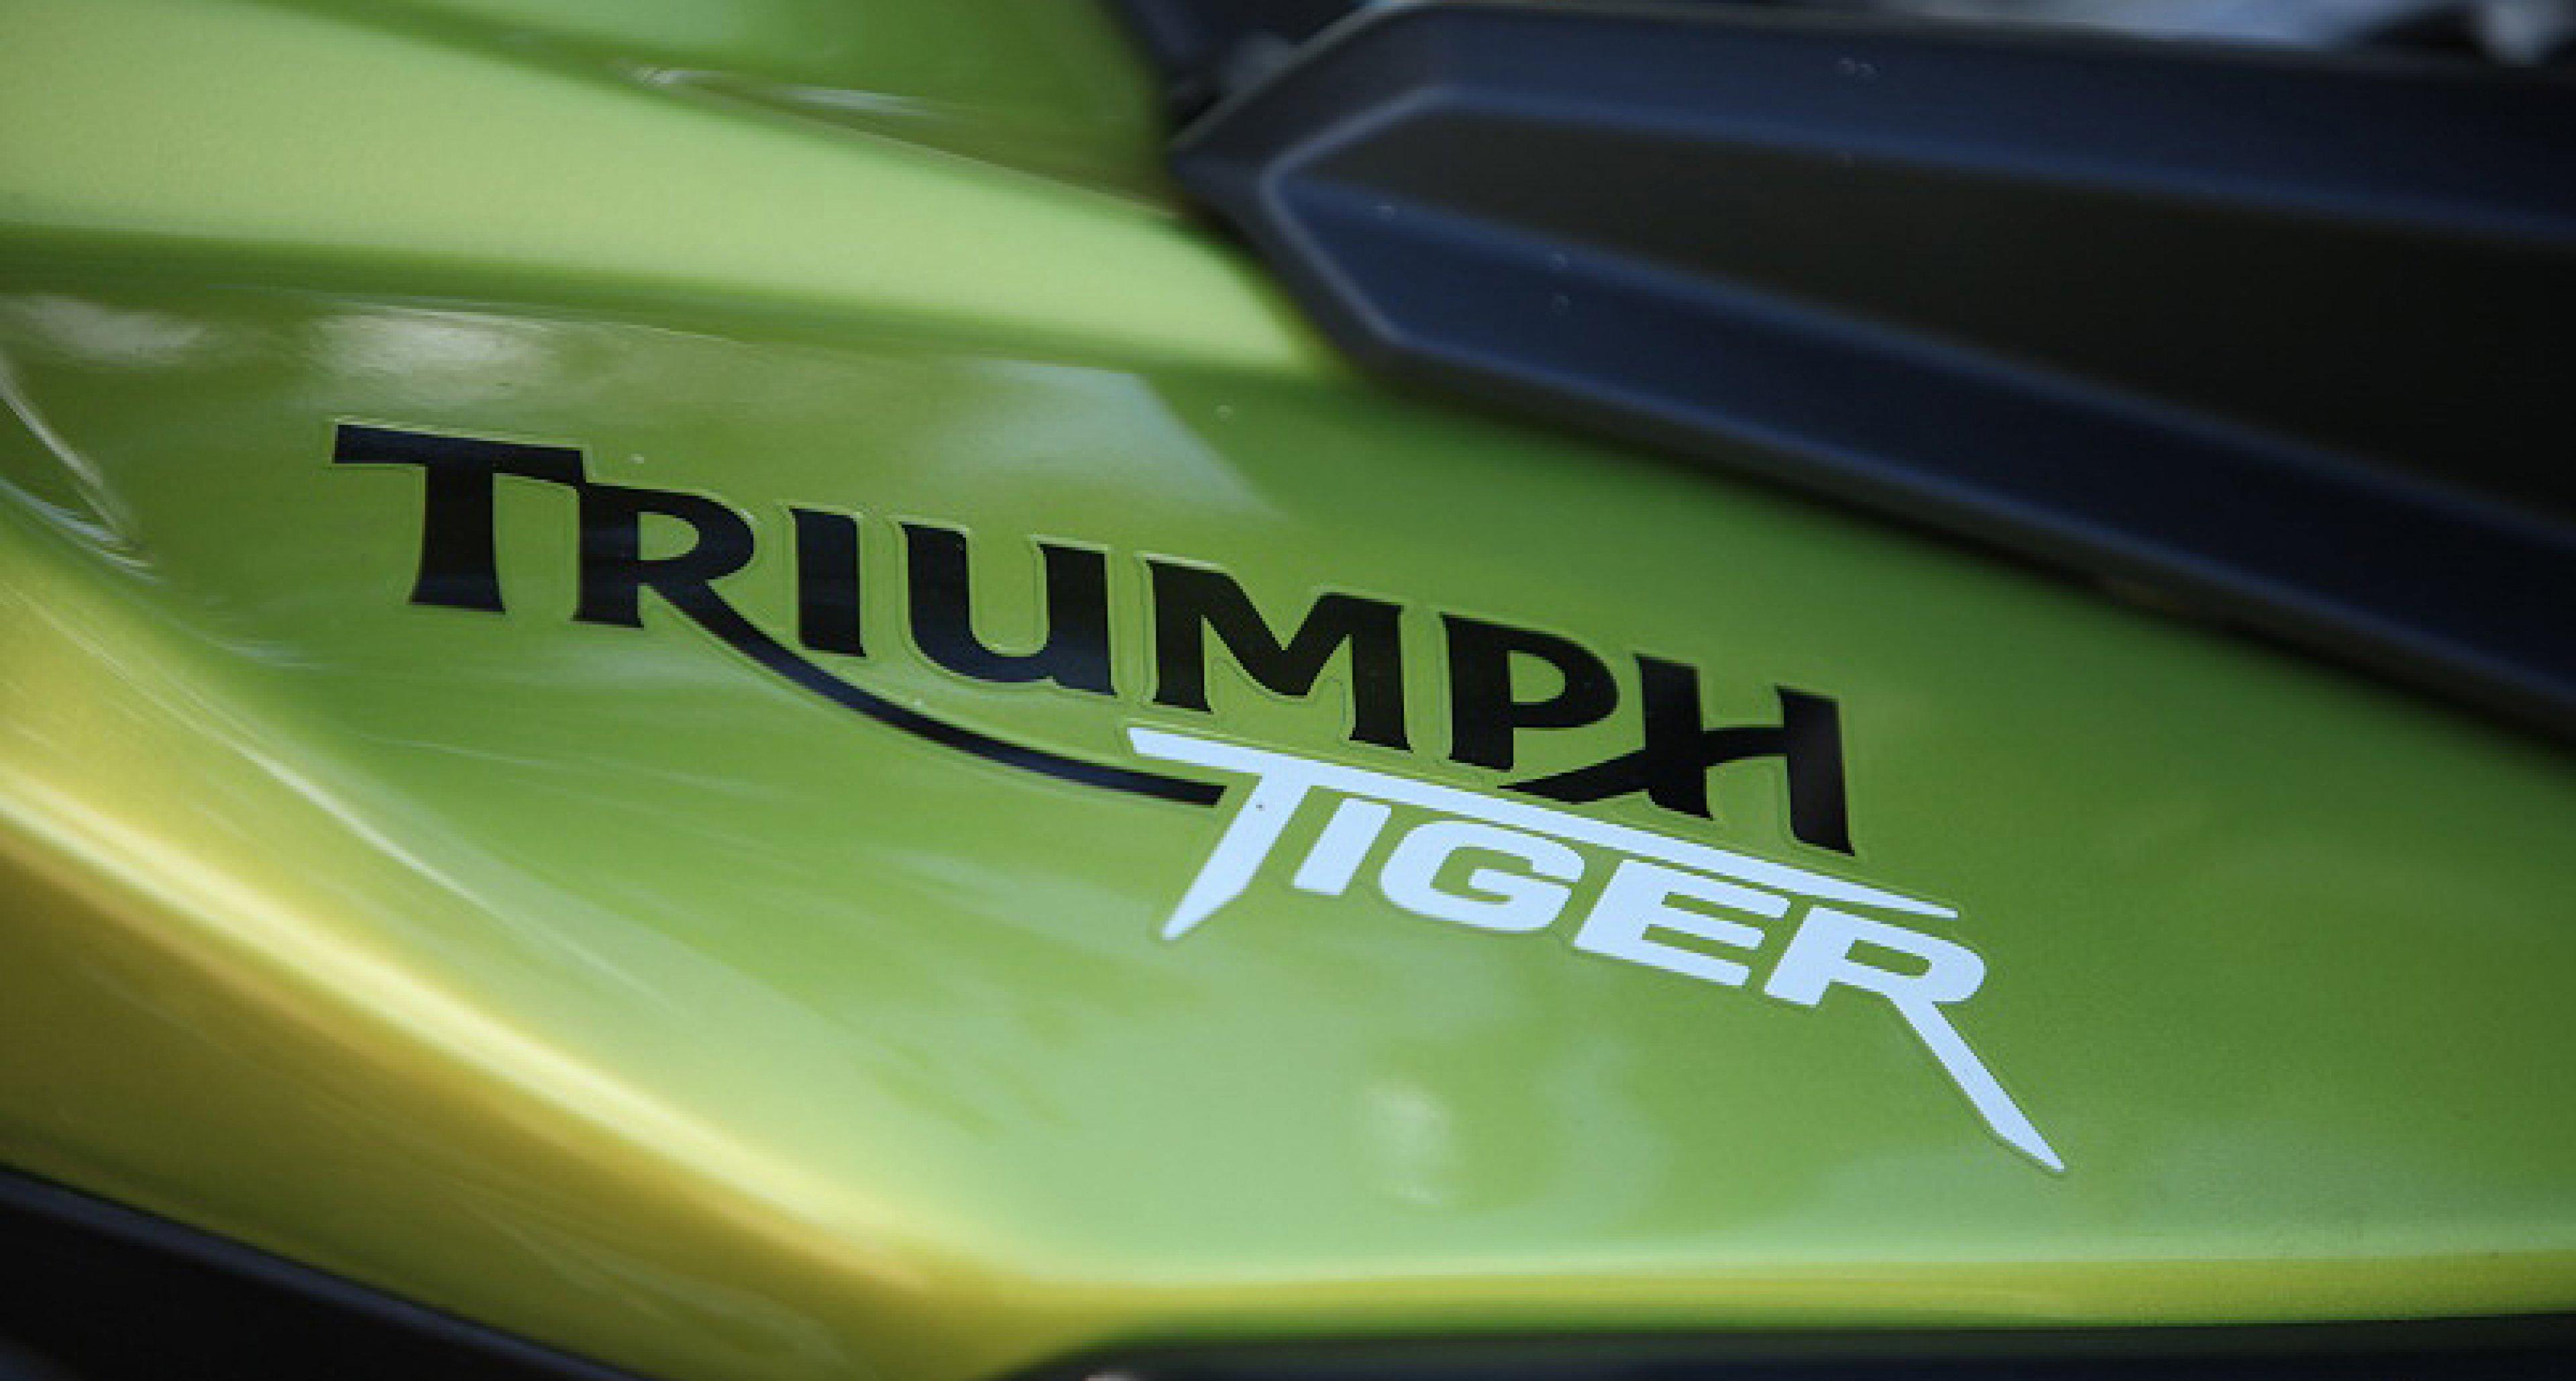 Ridden: Triumph Tiger 800